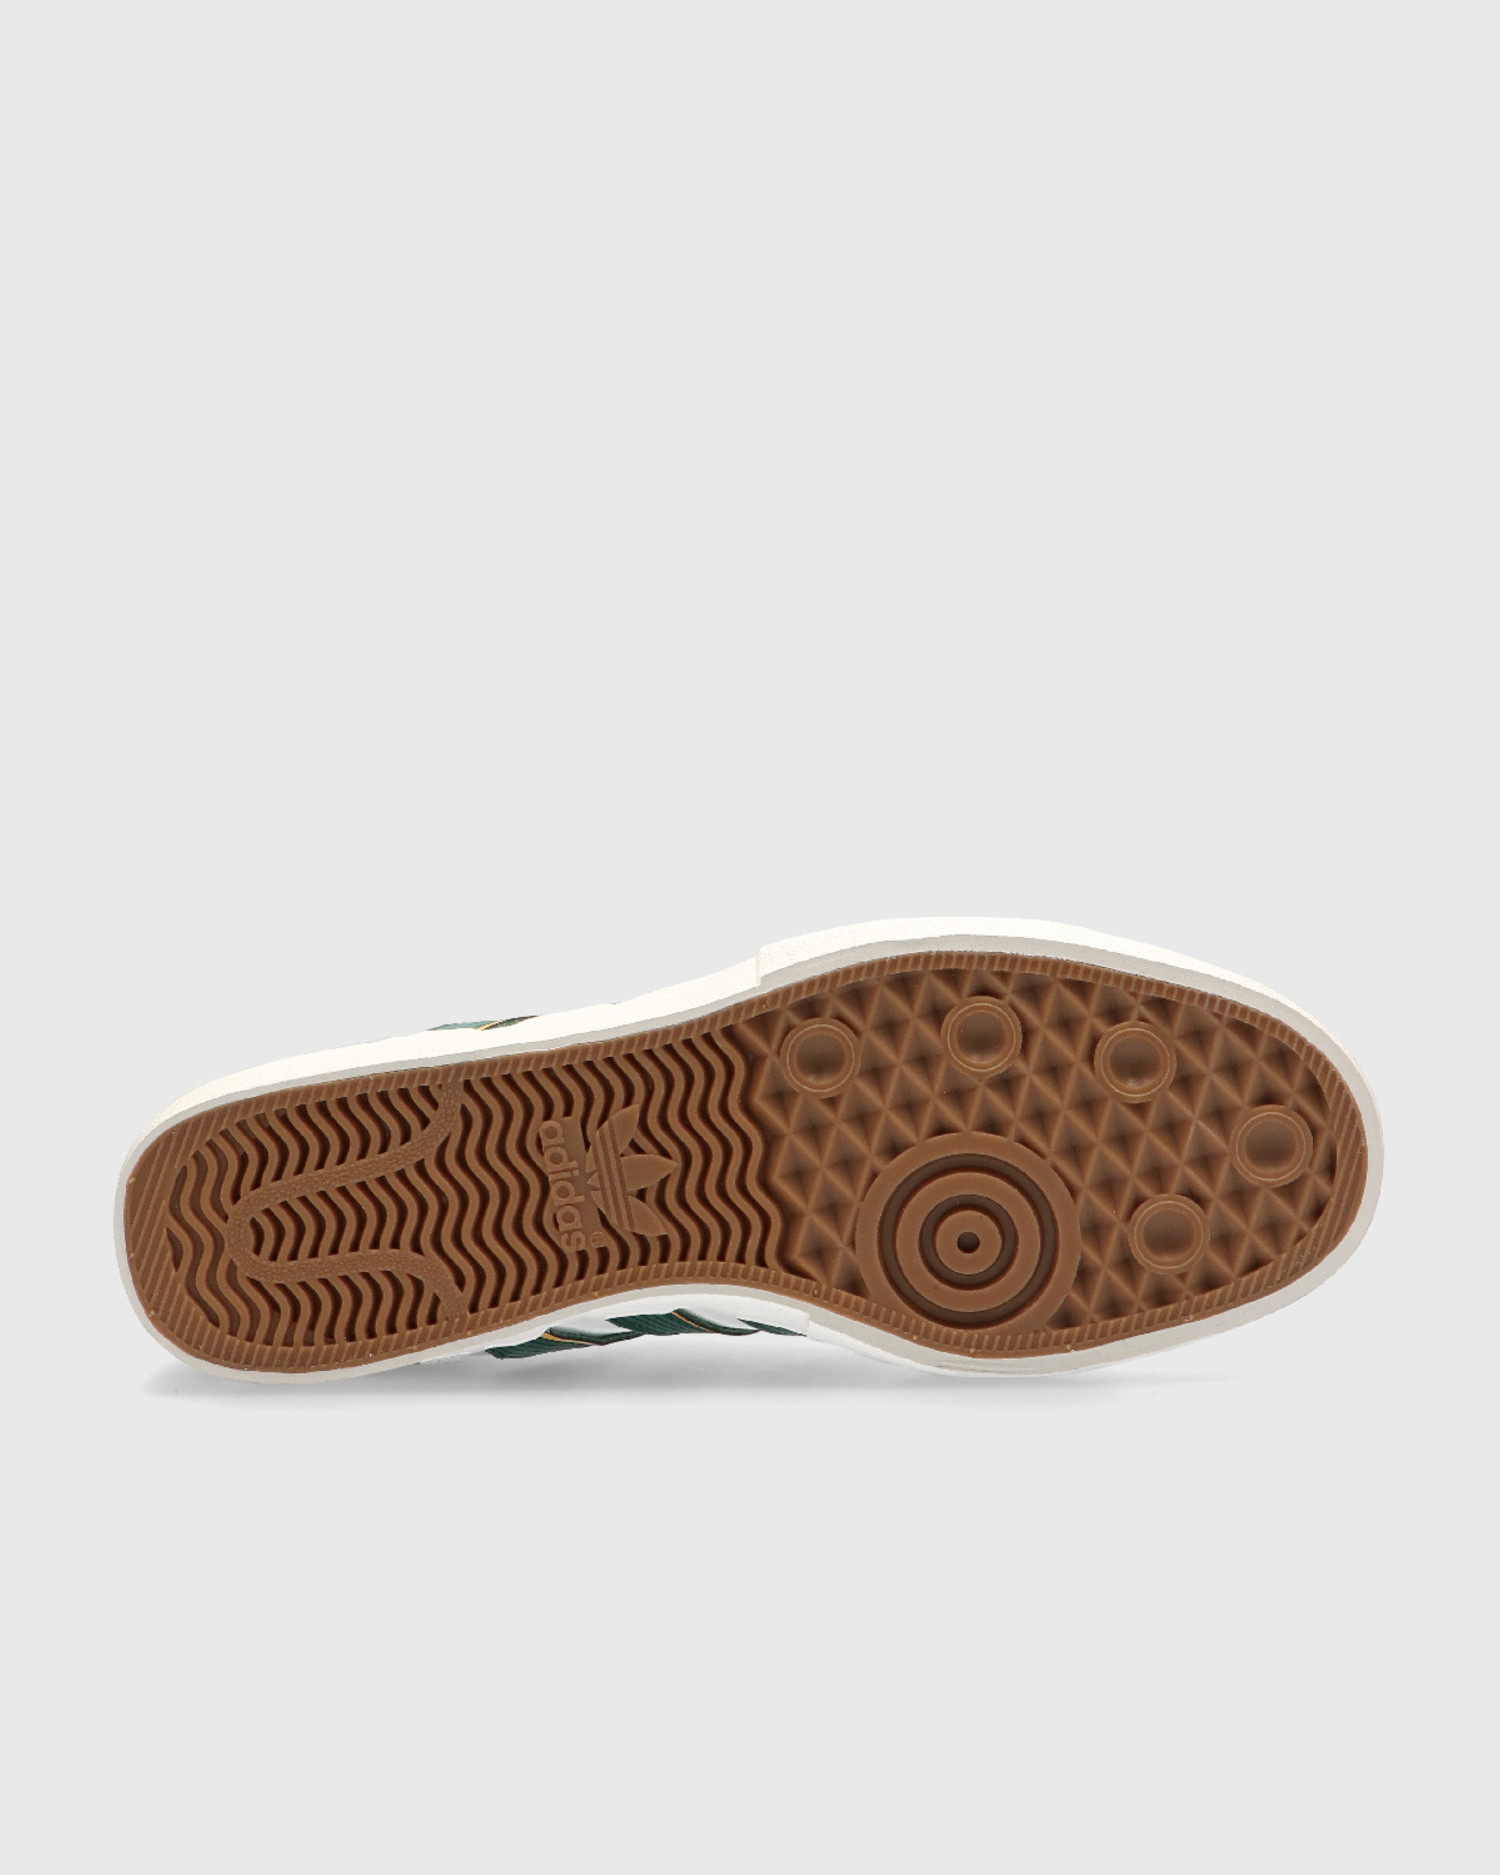 Adidas Matchbreak Super Cgreen/Ftwwht/Gol